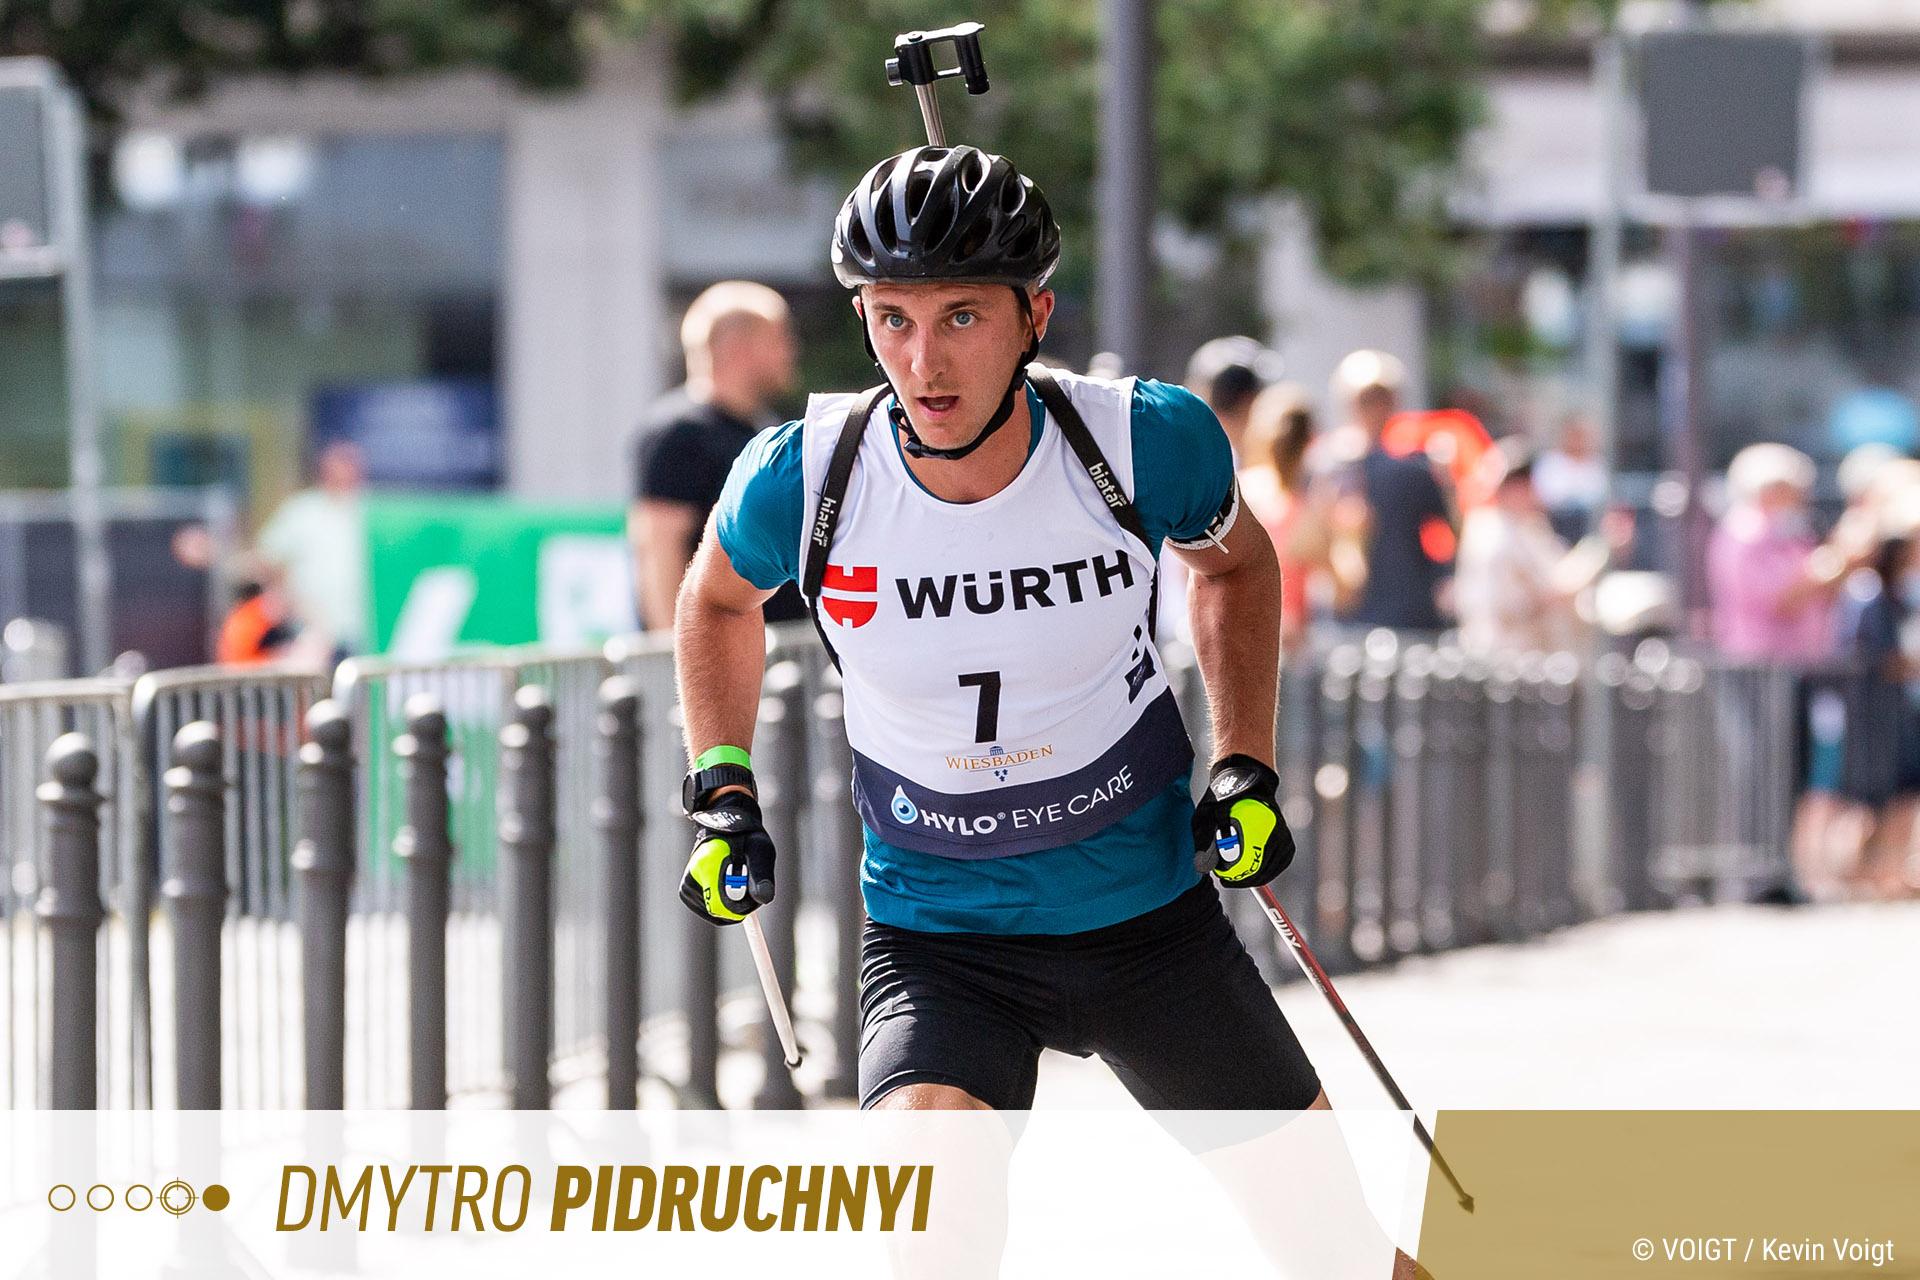 Athleten_DmytroPidruchnyi